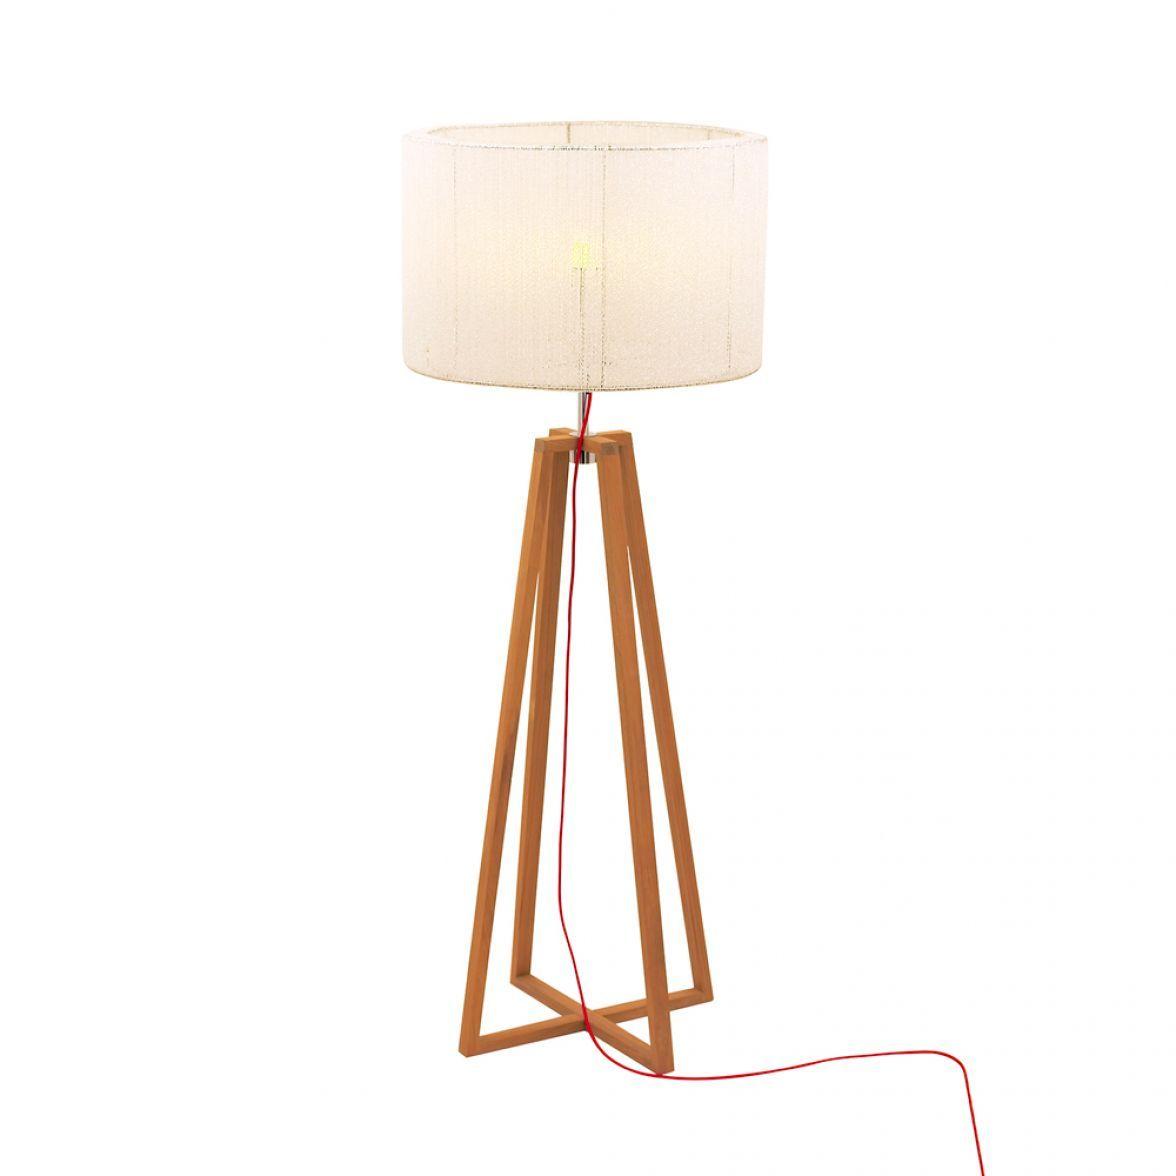 Club Lounge floor lamp